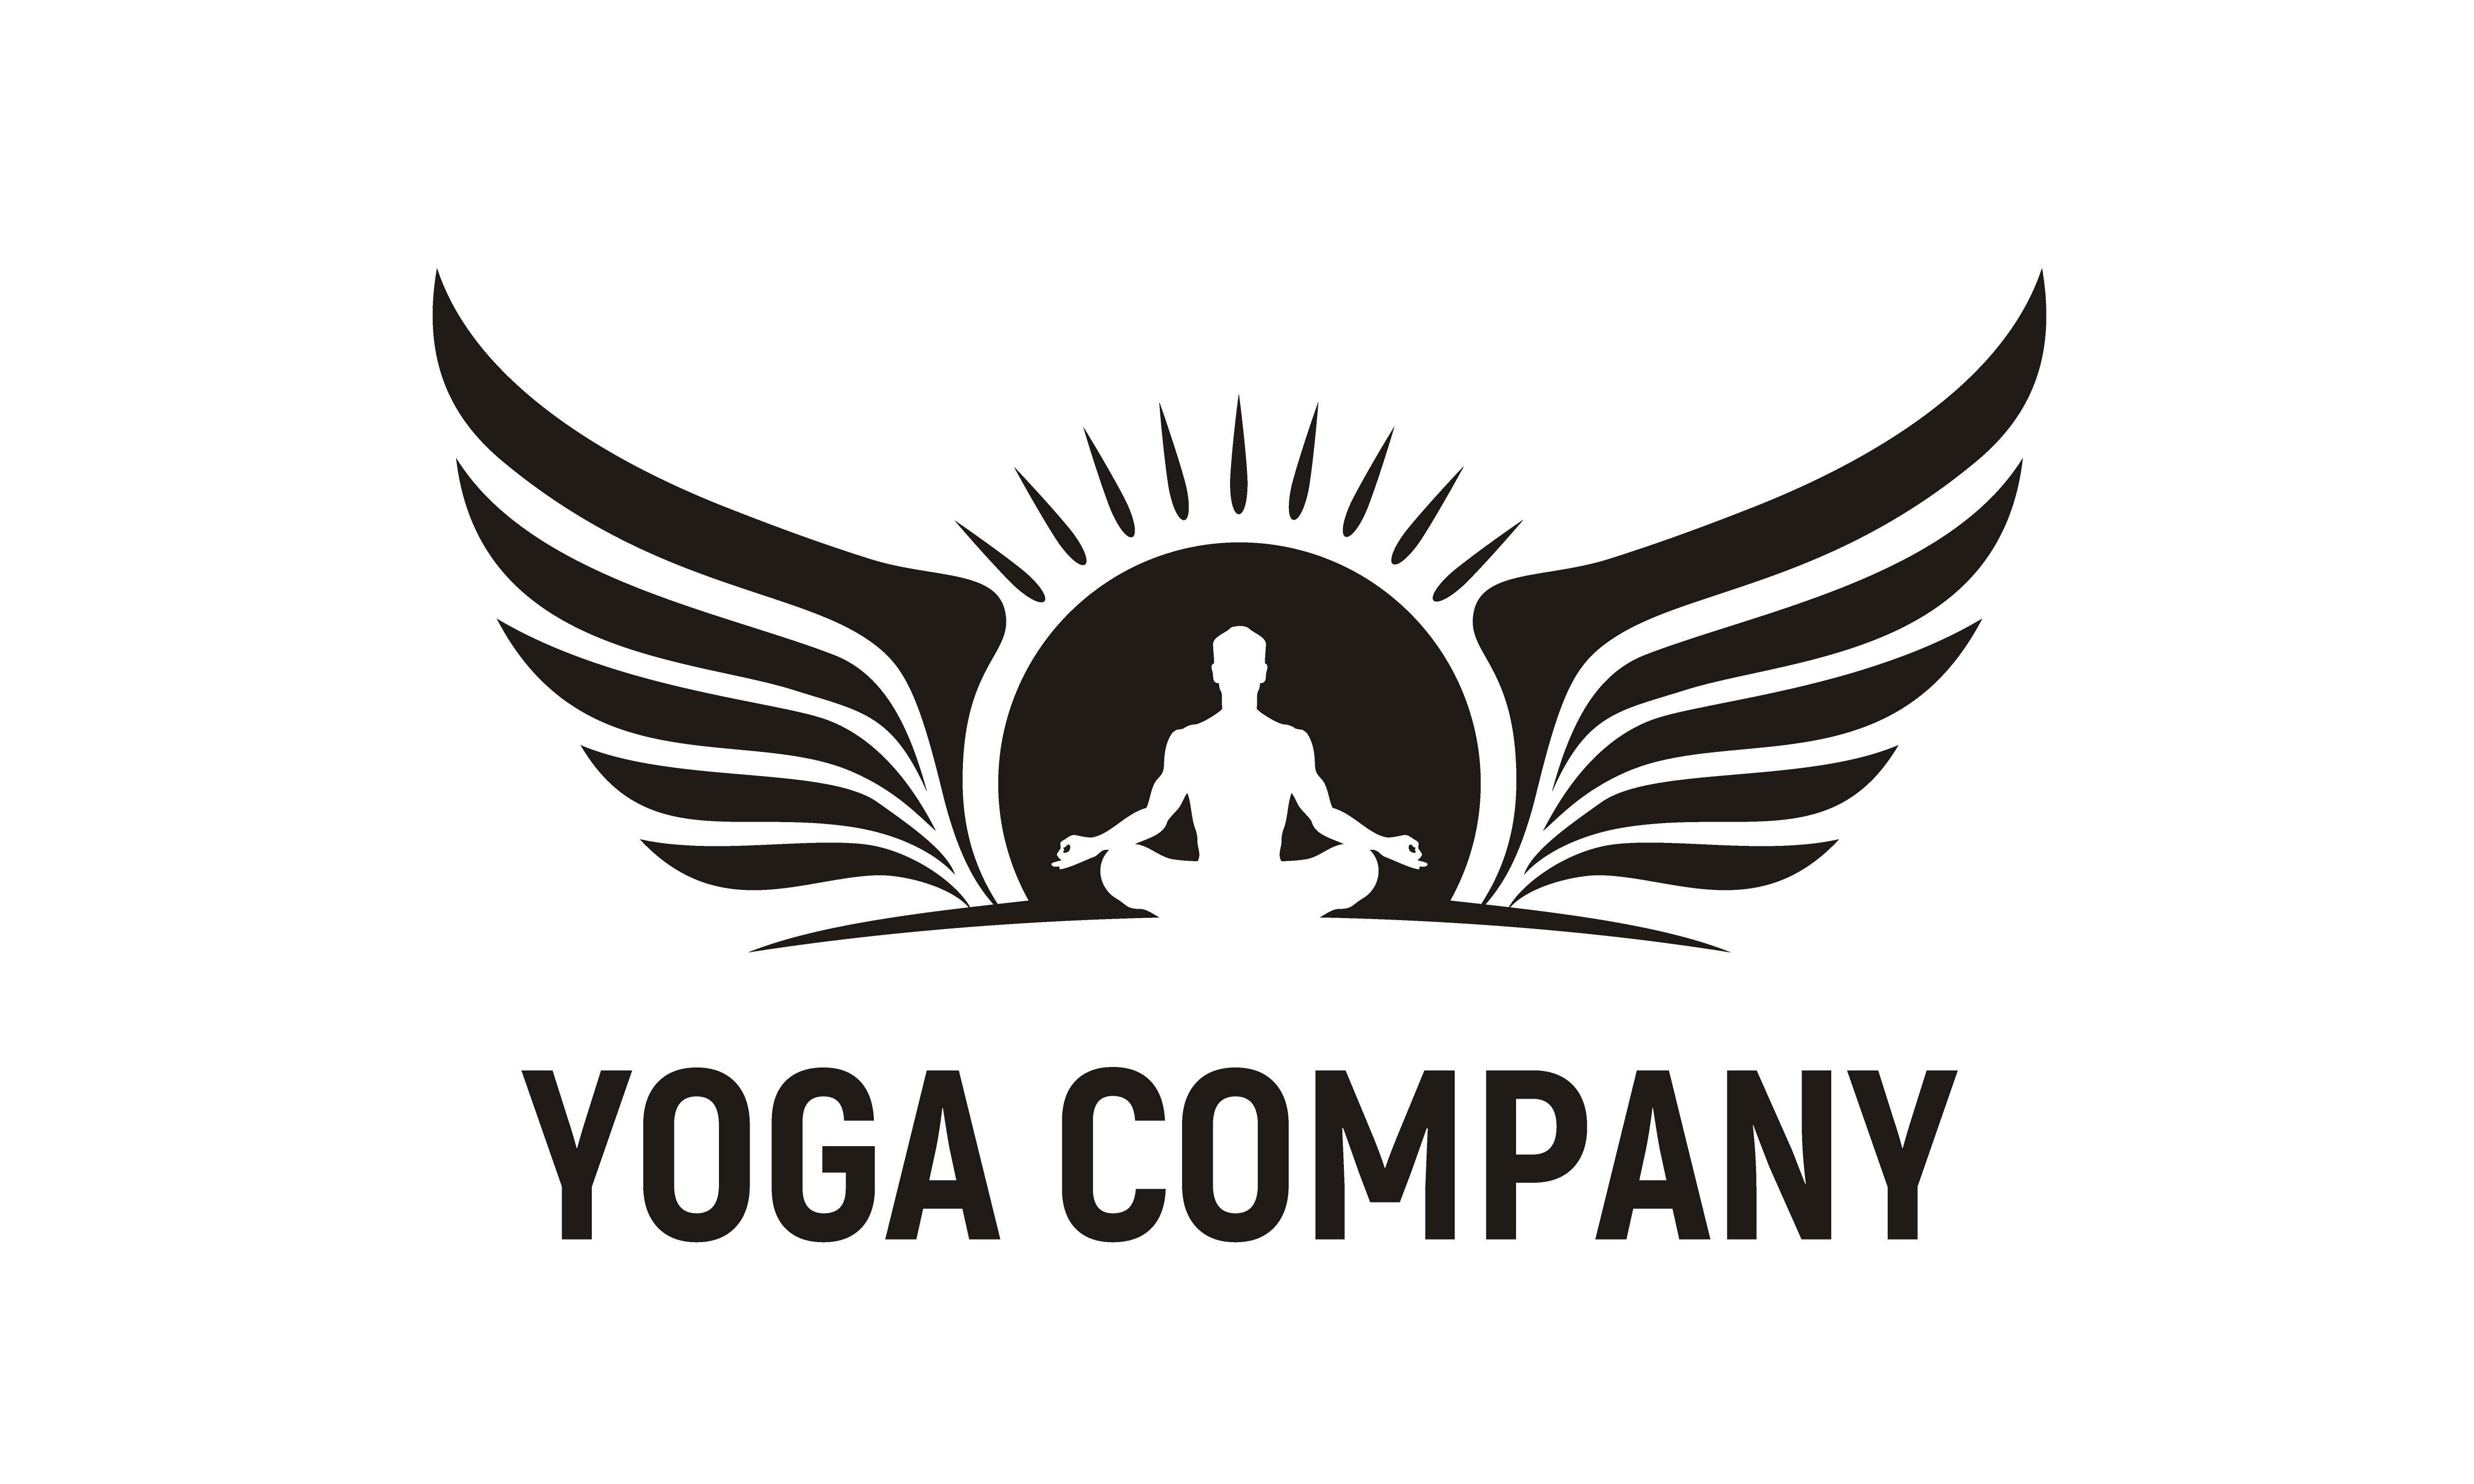 Meditation Man Yoga Sun Wings Logo Graphic By Enola99d Creative Fabrica Spiritual Logo Graphic Design Logo Template Logo